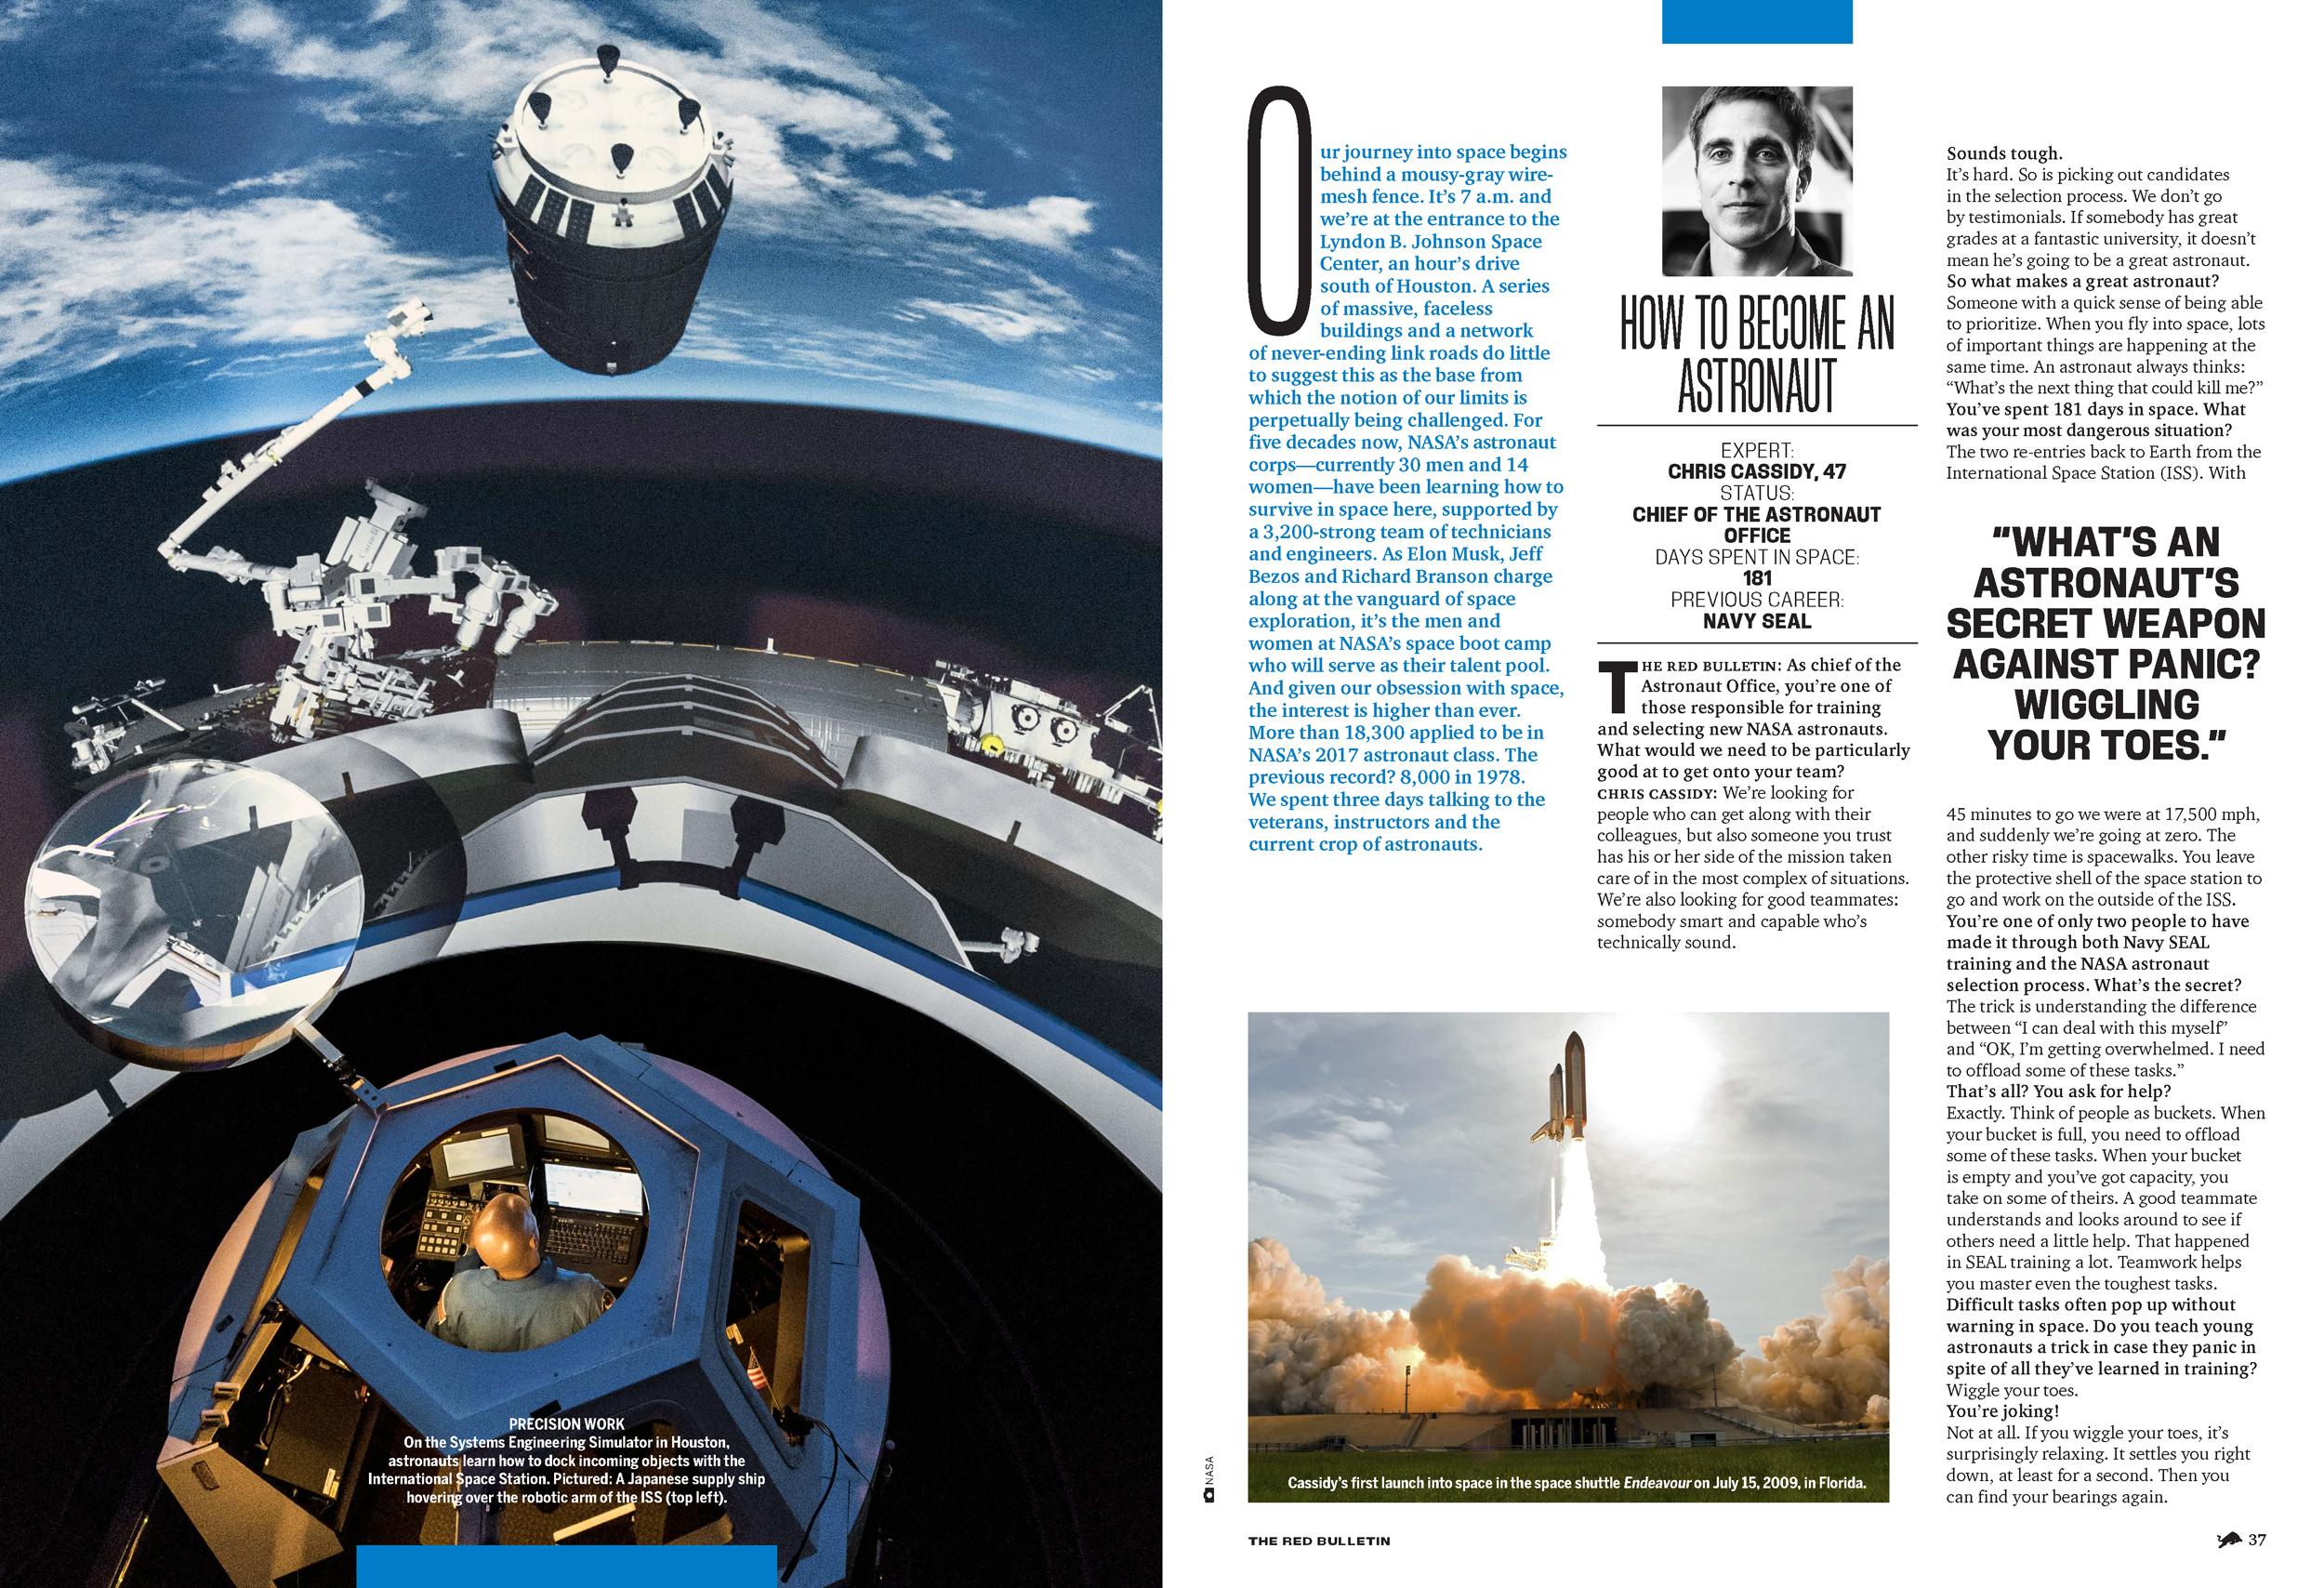 Justin_Bastien_Red_Bulletin_21070601_NASA_Feature_Page_4.jpg